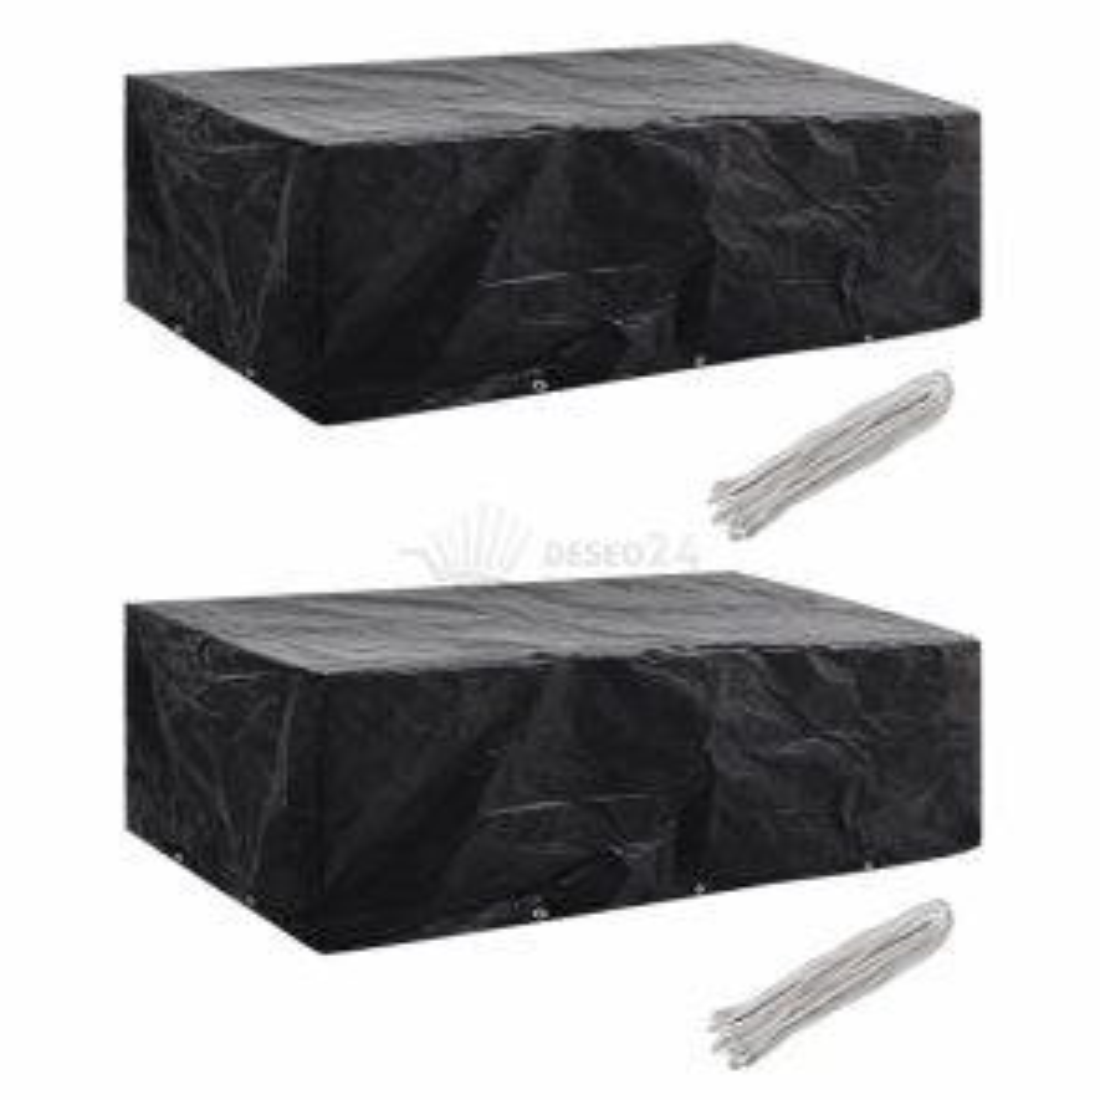 vidaXL Plachty na zahradní nábytek 2 ks polyratan 10 oček 300 x 140 cm [279124]